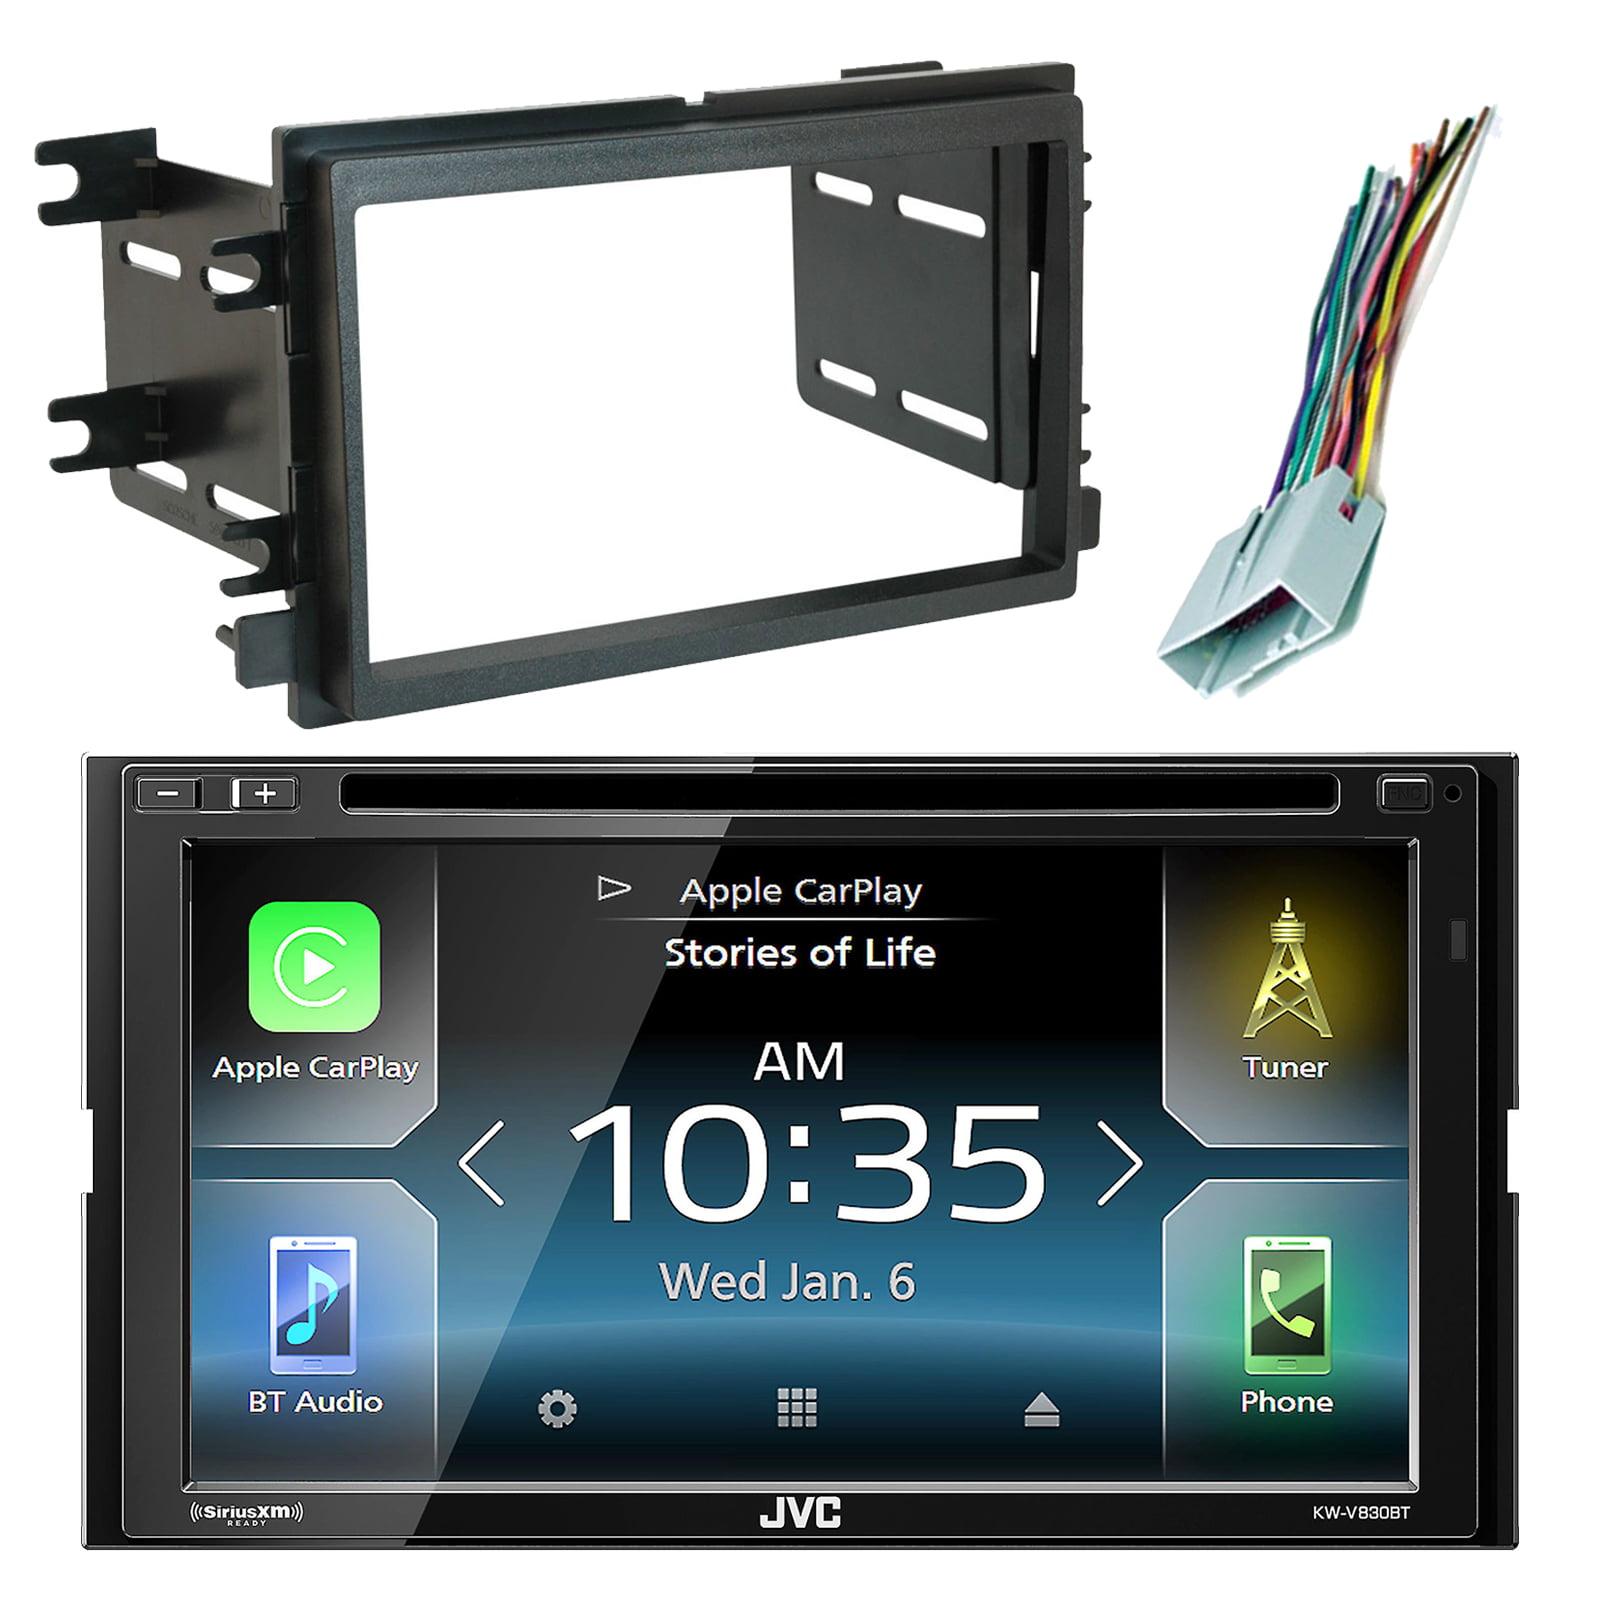 [SCHEMATICS_49CH]  JVC KWV830BT Double DIN CD Bluetooth Stereo Car Audio Receiver, Scosche  FD1426B Dash Kit Install Kit, w/ FD23B Radio Wire Harness (Fits 2004-Up  Select Ford) - Walmart.com - Walmart.com | Fd23b Wiring Harness |  | Walmart.com